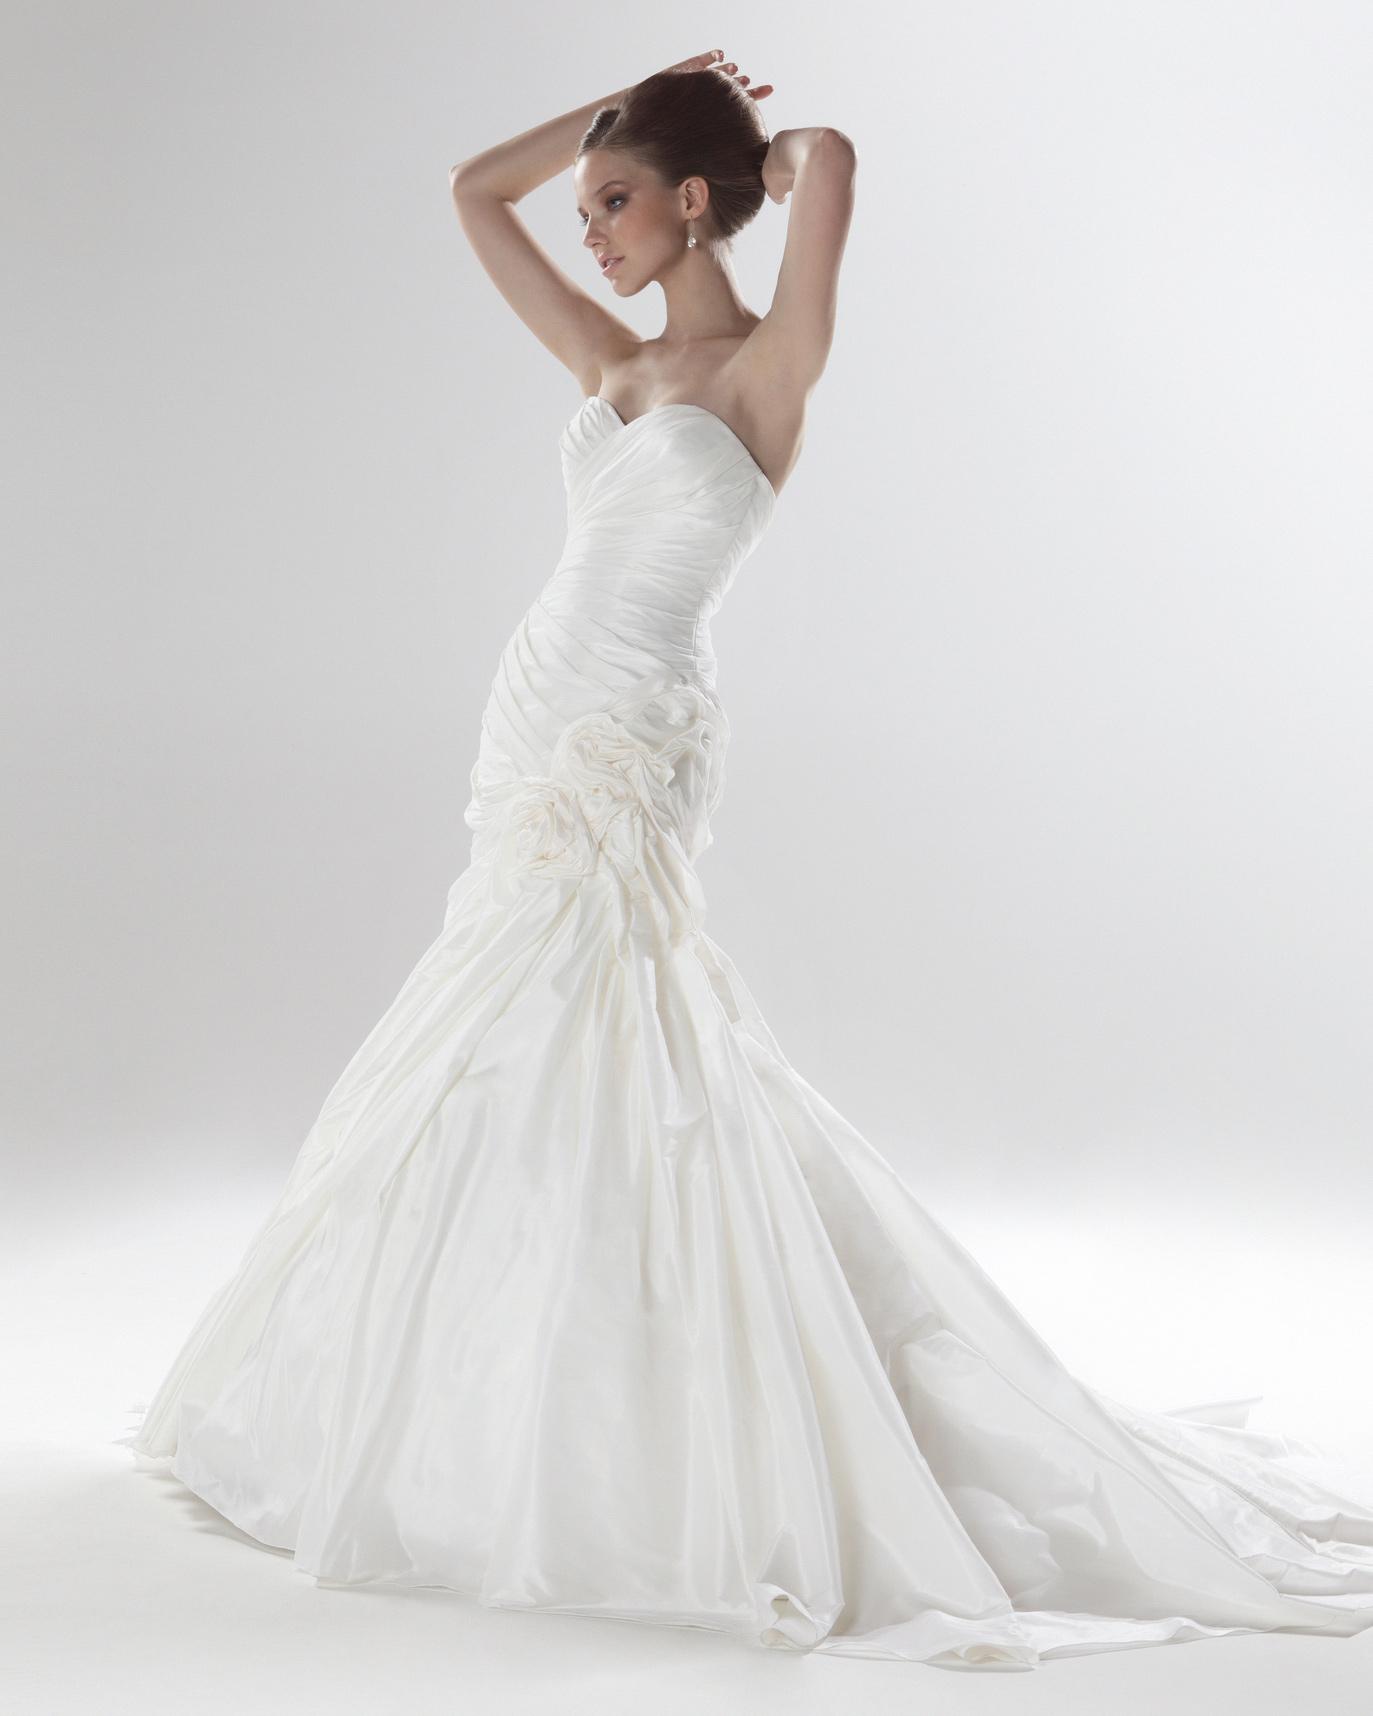 ellis-bridal-11135.jpg